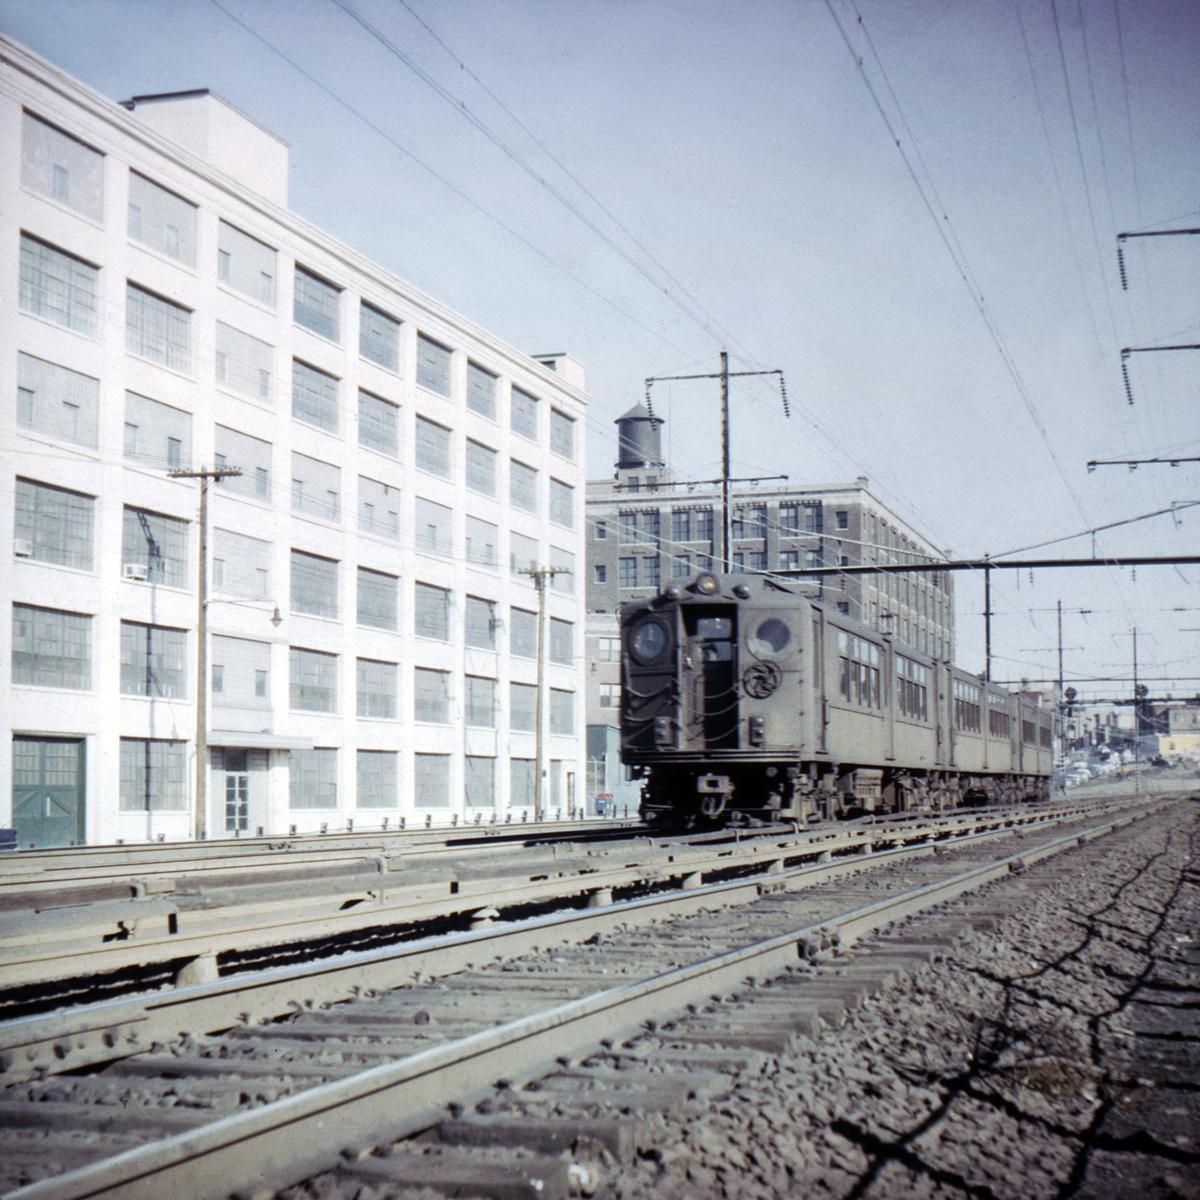 (540k, 1024x683)<br><b>Country:</b> United States<br><b>City:</b> Jersey City, NJ<br><b>System:</b> PATH<br><b>Location:</b> West Side Avenue Grade Crossing <br><b>Car:</b> H&M  <br><b>Collection of:</b> David Pirmann<br><b>Date:</b> 4/1966<br><b>Viewed (this week/total):</b> 1 / 4853